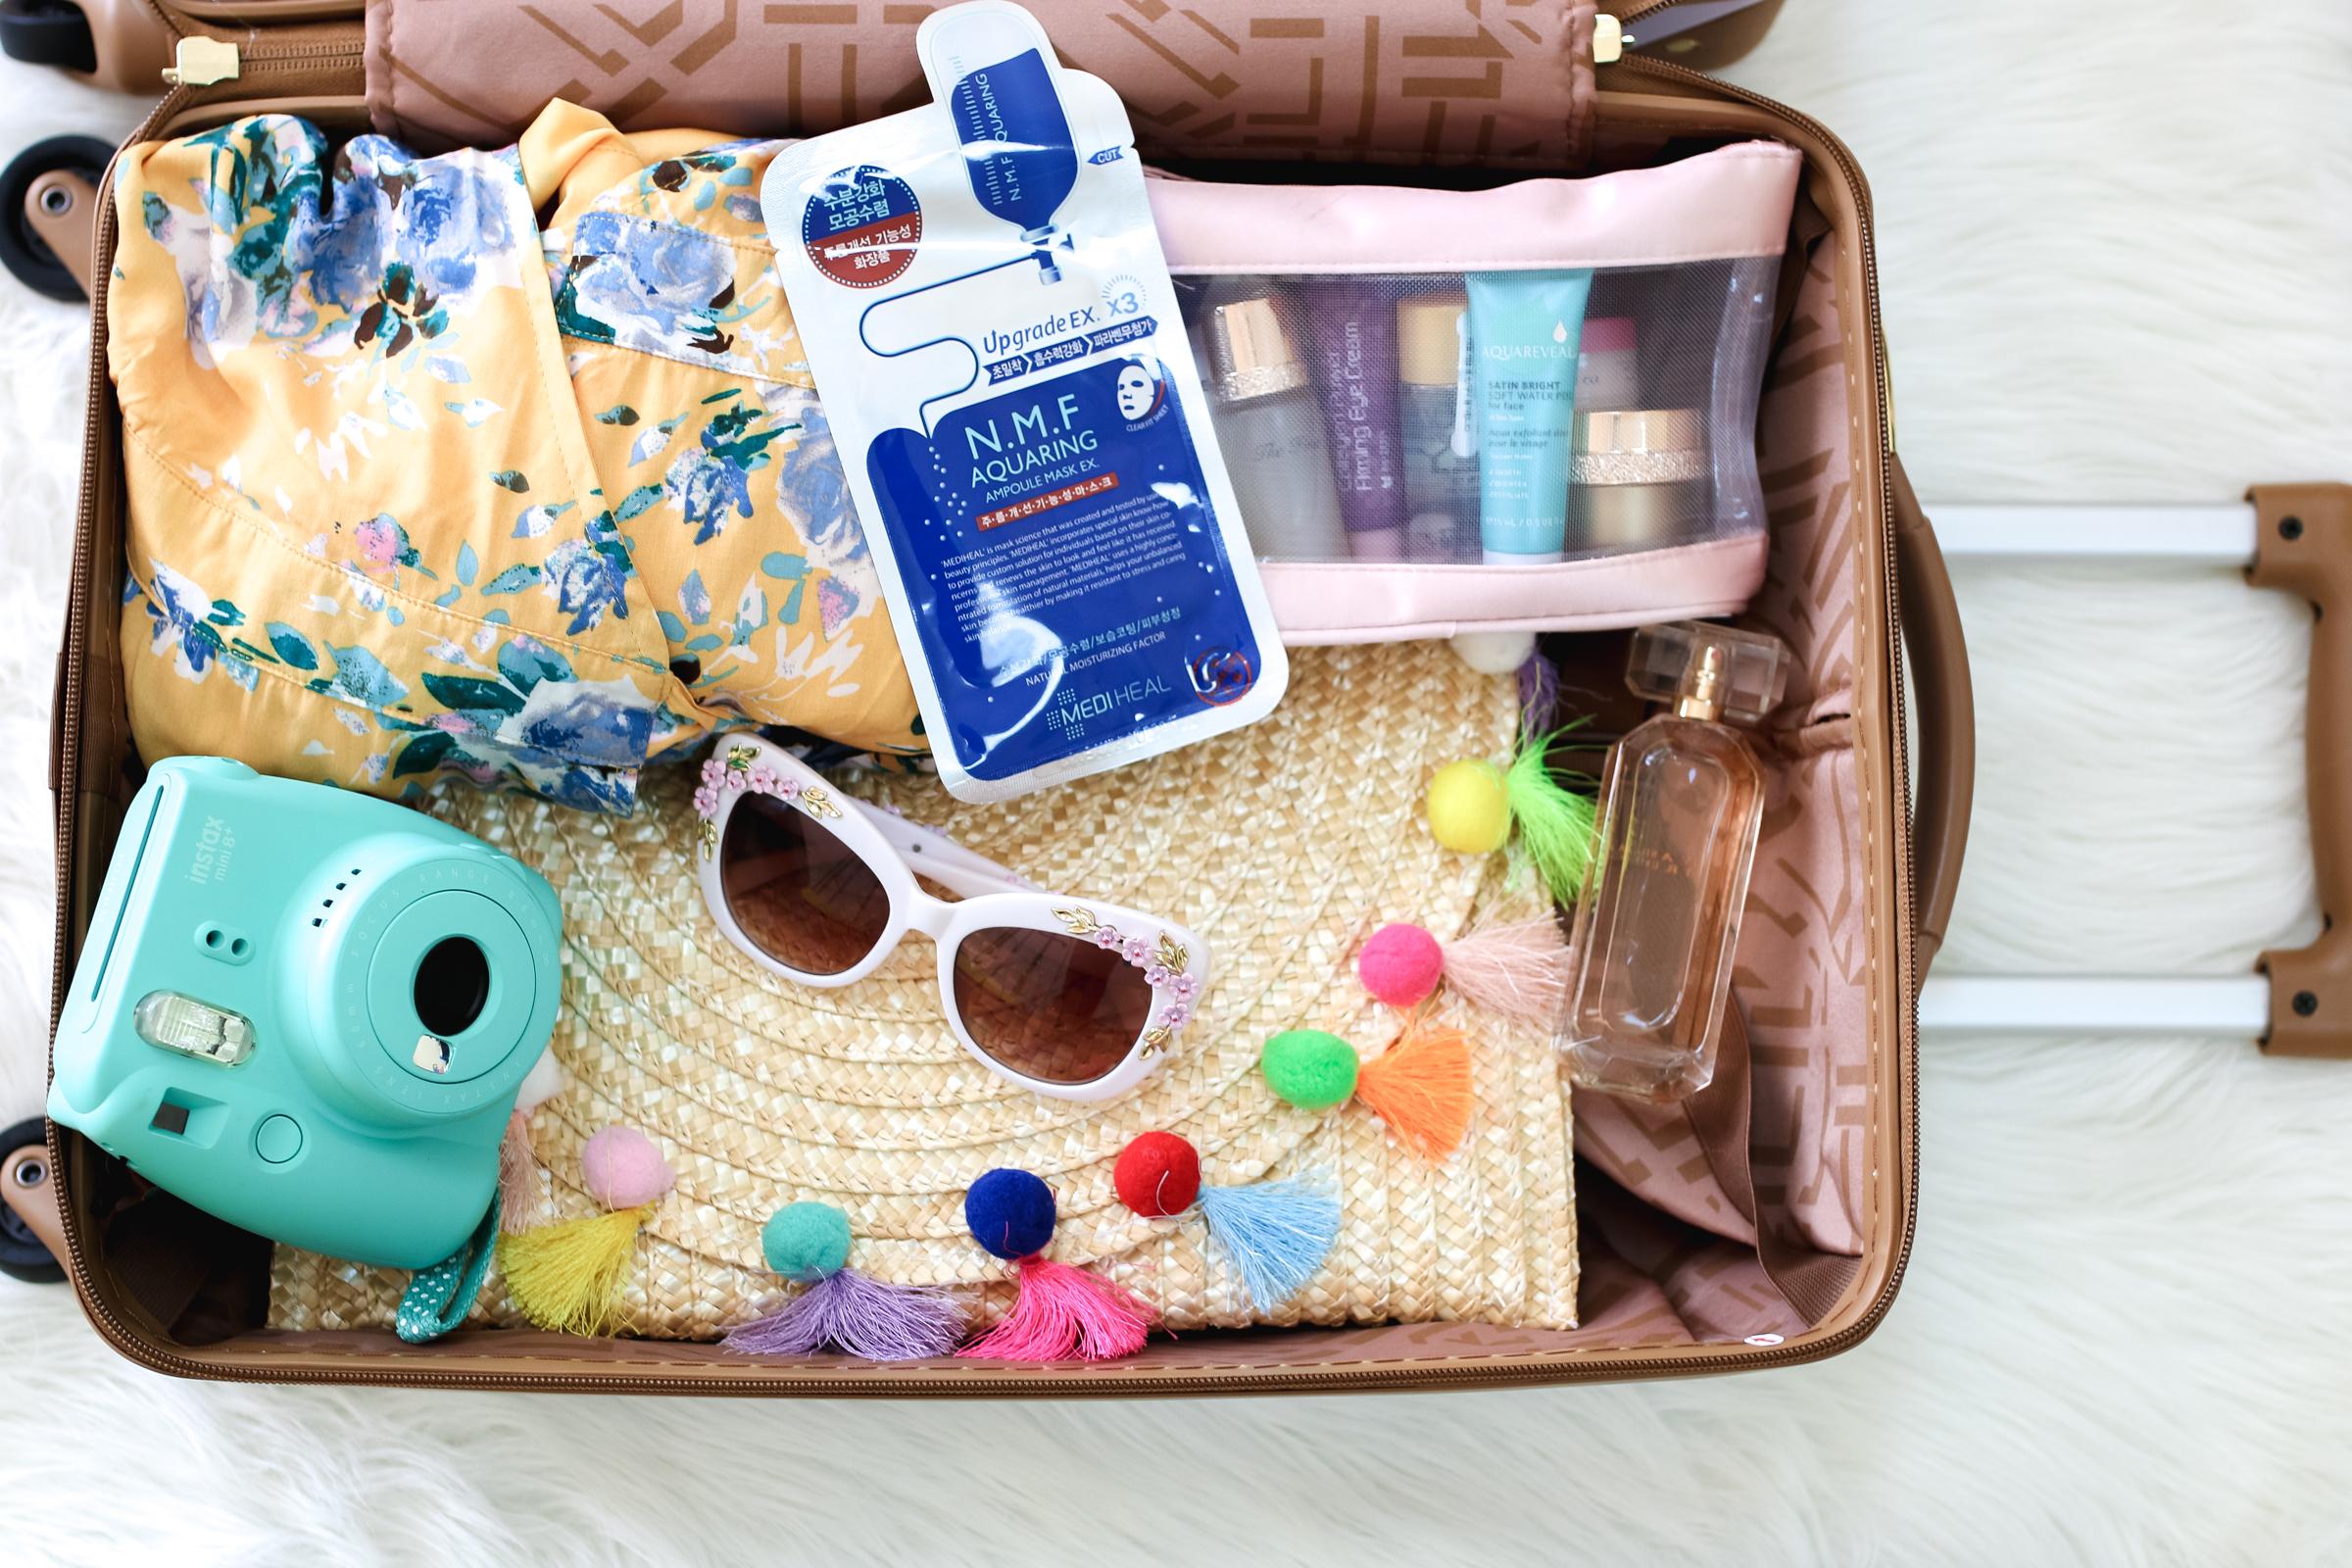 My Korean Skincare Routine with SKYN BOX by Utah fashion blogger Sandy A La Mode